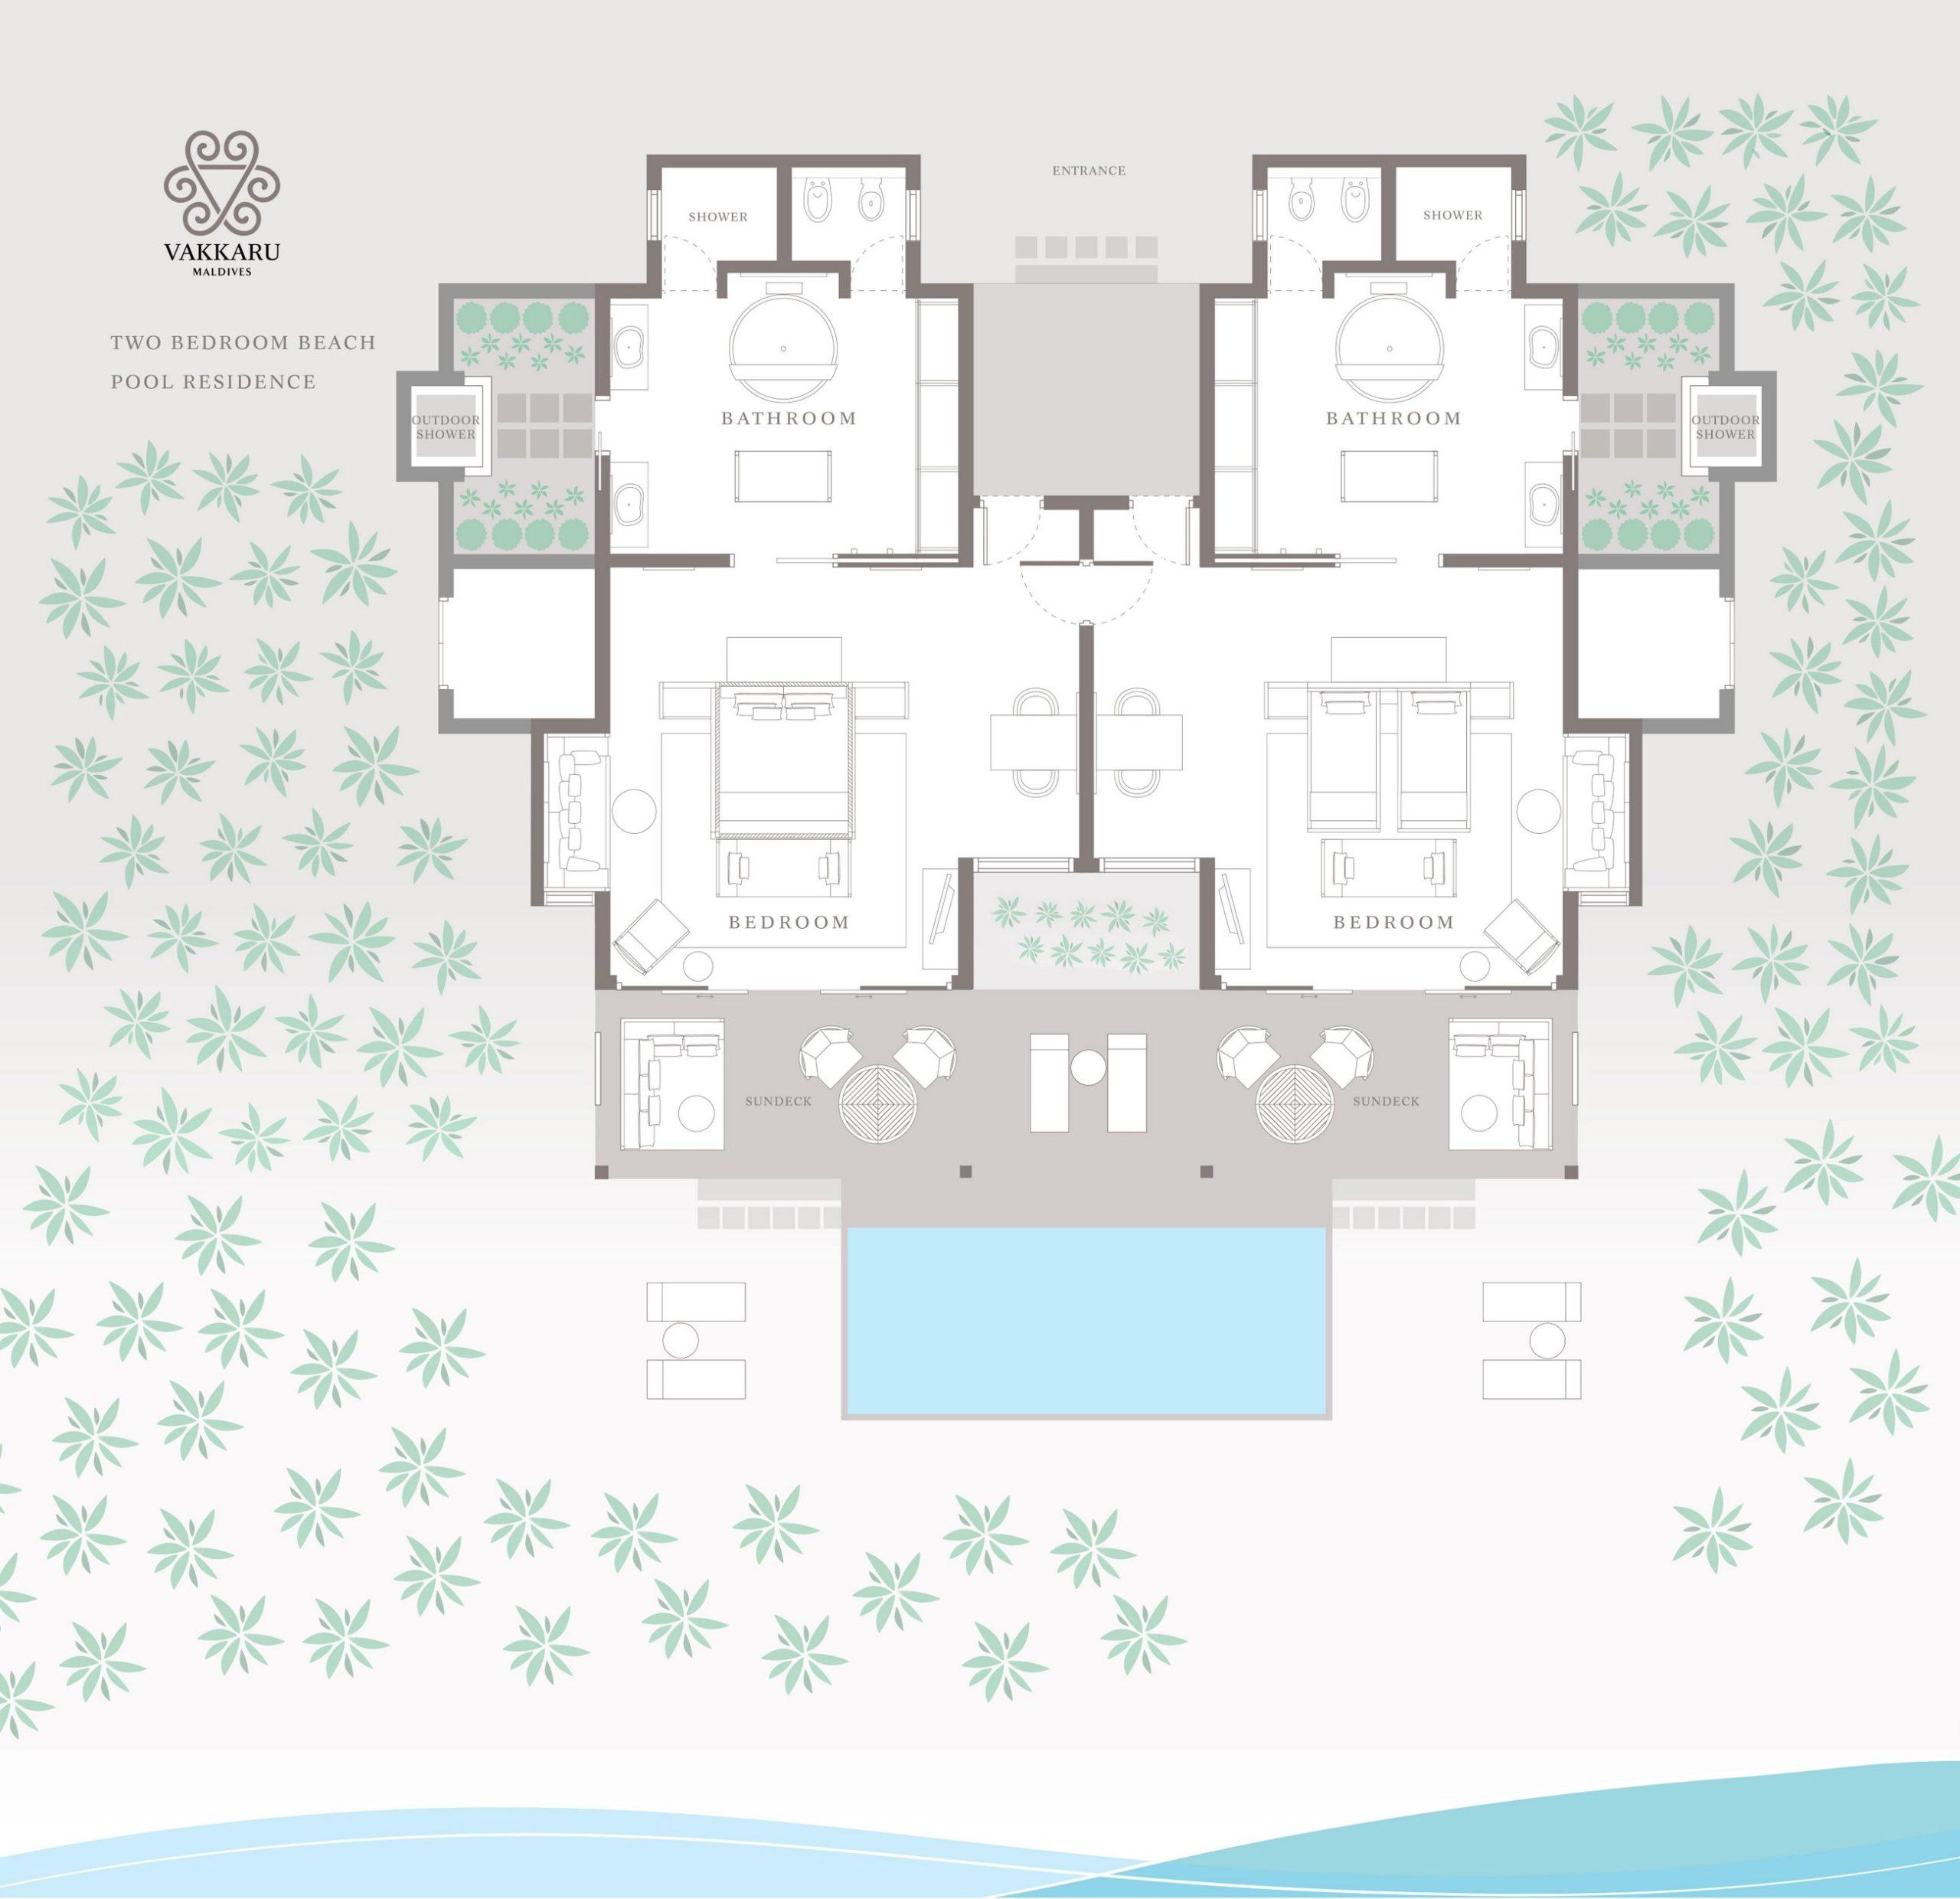 Мальдивы, отель Vakkaru Maldives, план-схема номера Two Bed Room Beach Pool Residence